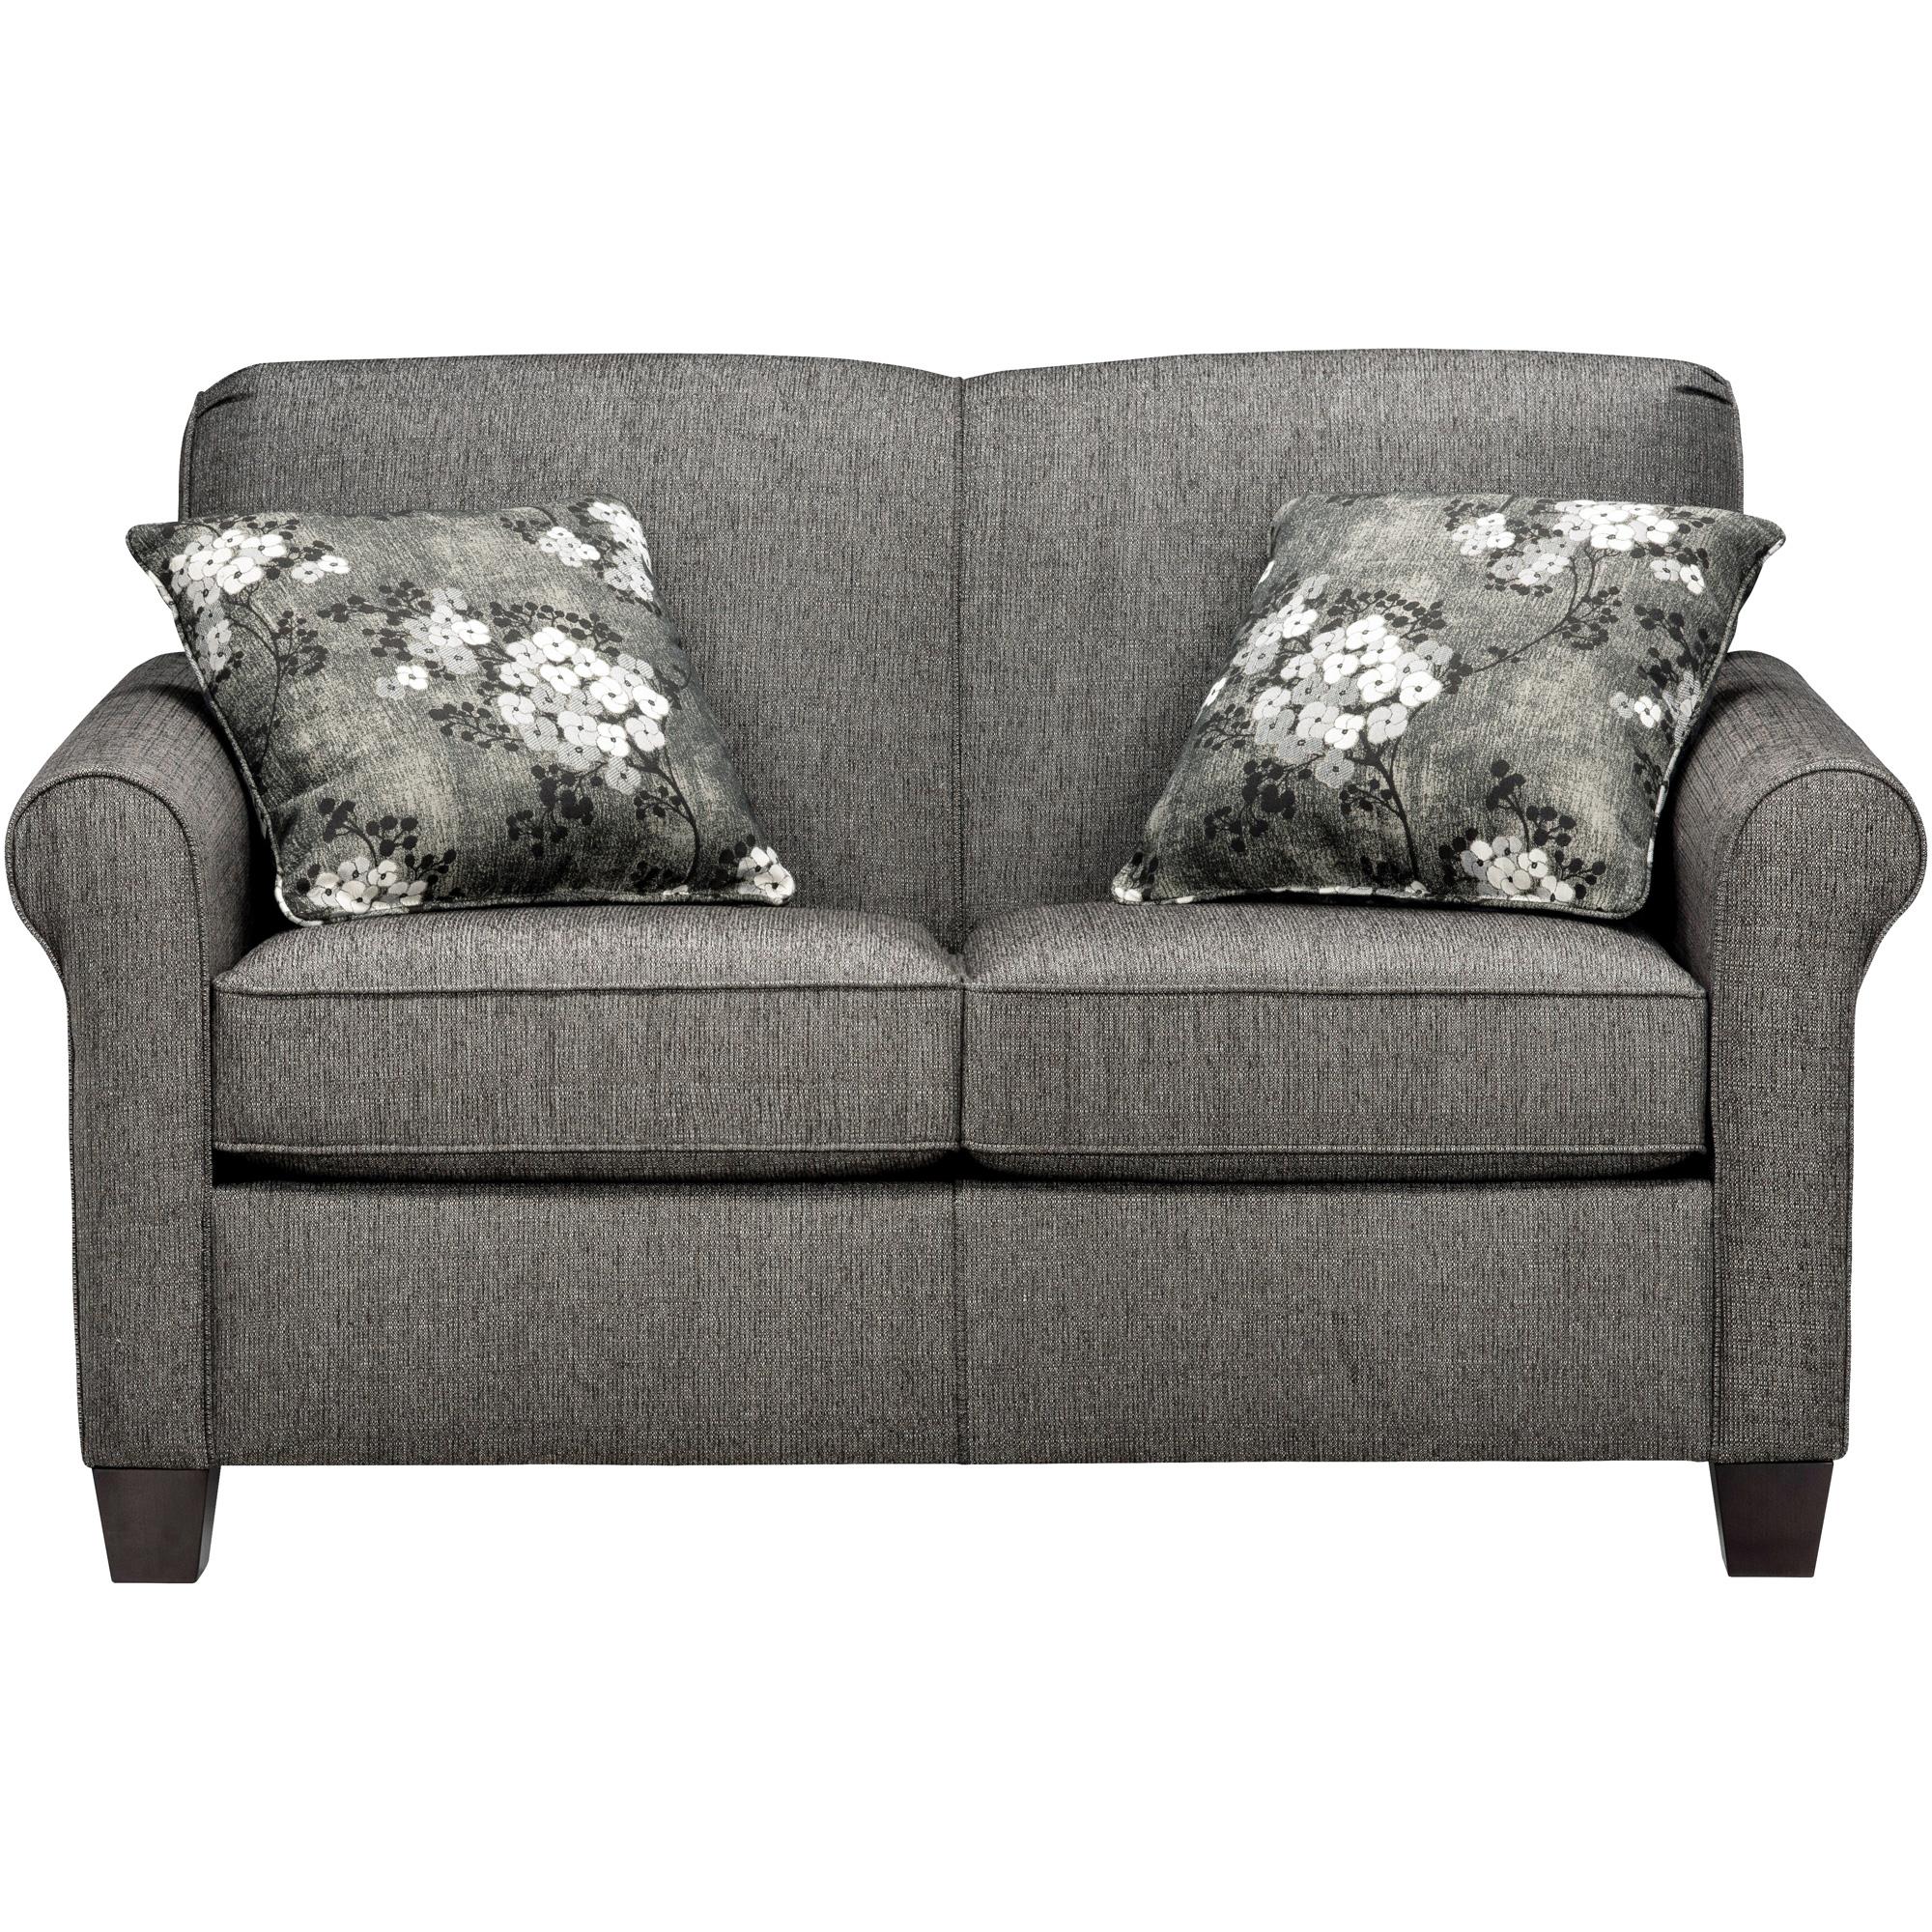 Dimensions By England | York Granite Twin Visco Sleeper Sofa